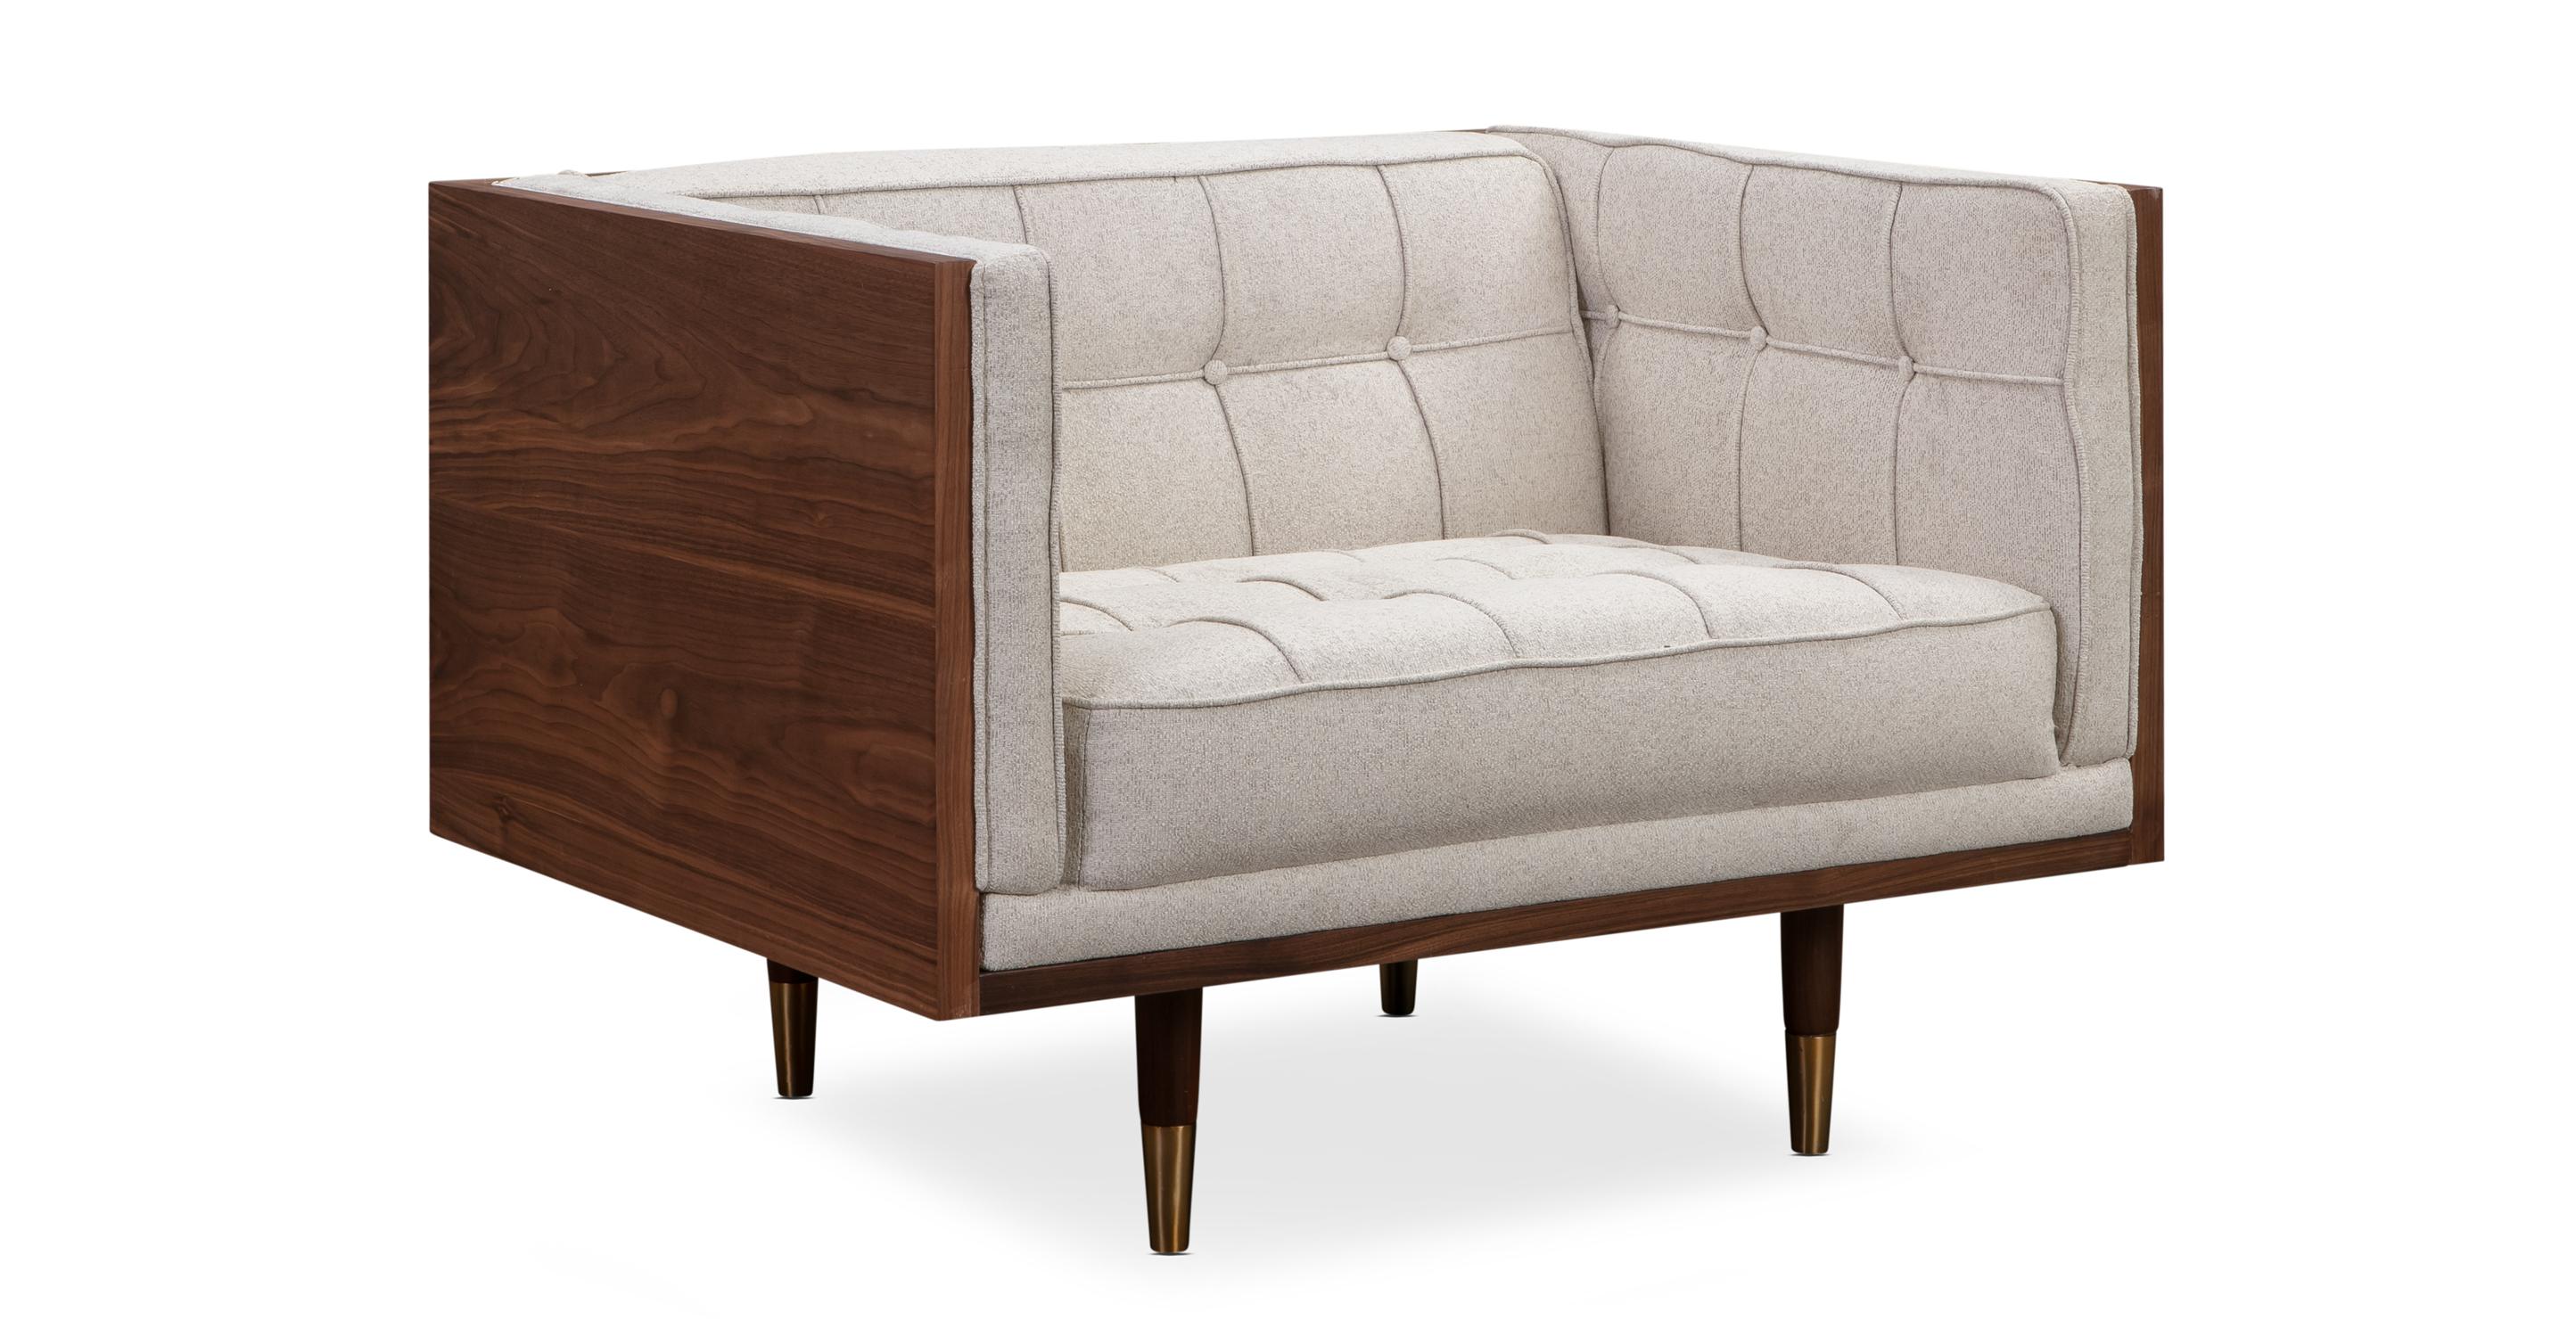 Woodrow Box Fabric Chair, Walnut/Mello